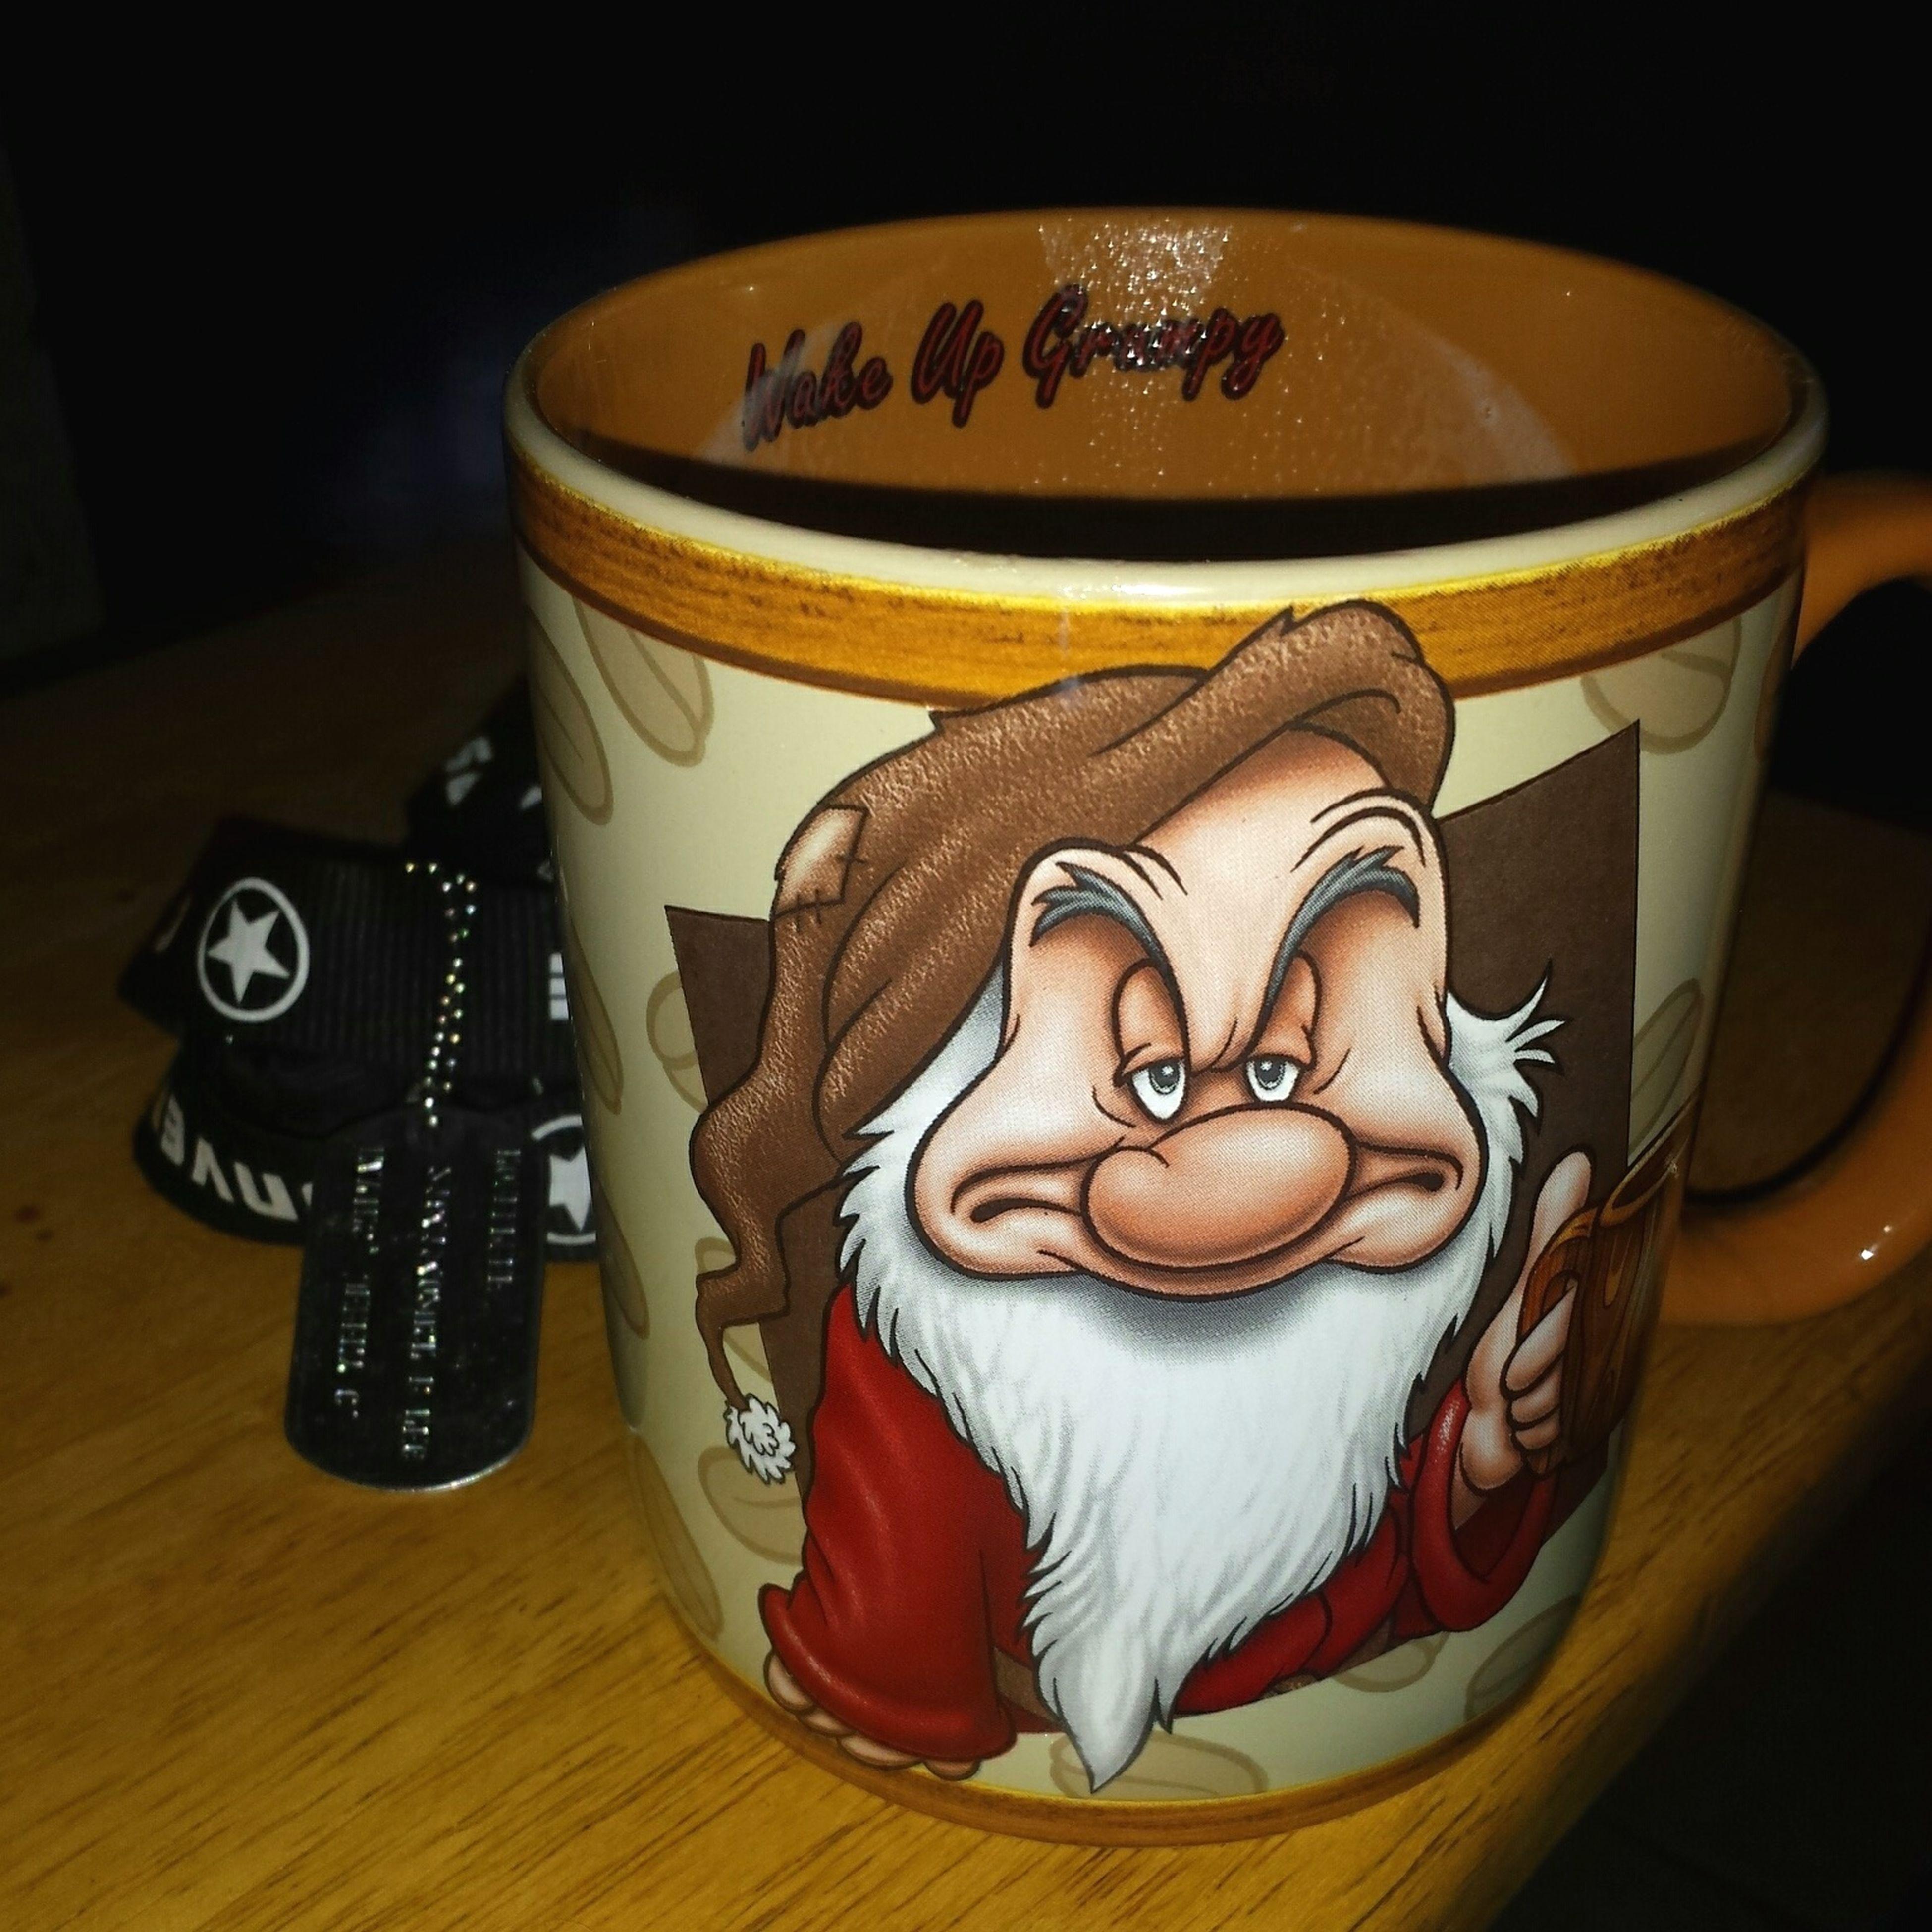 Vanila Brule Good Morning Grumpy Takeontheday Smileoften